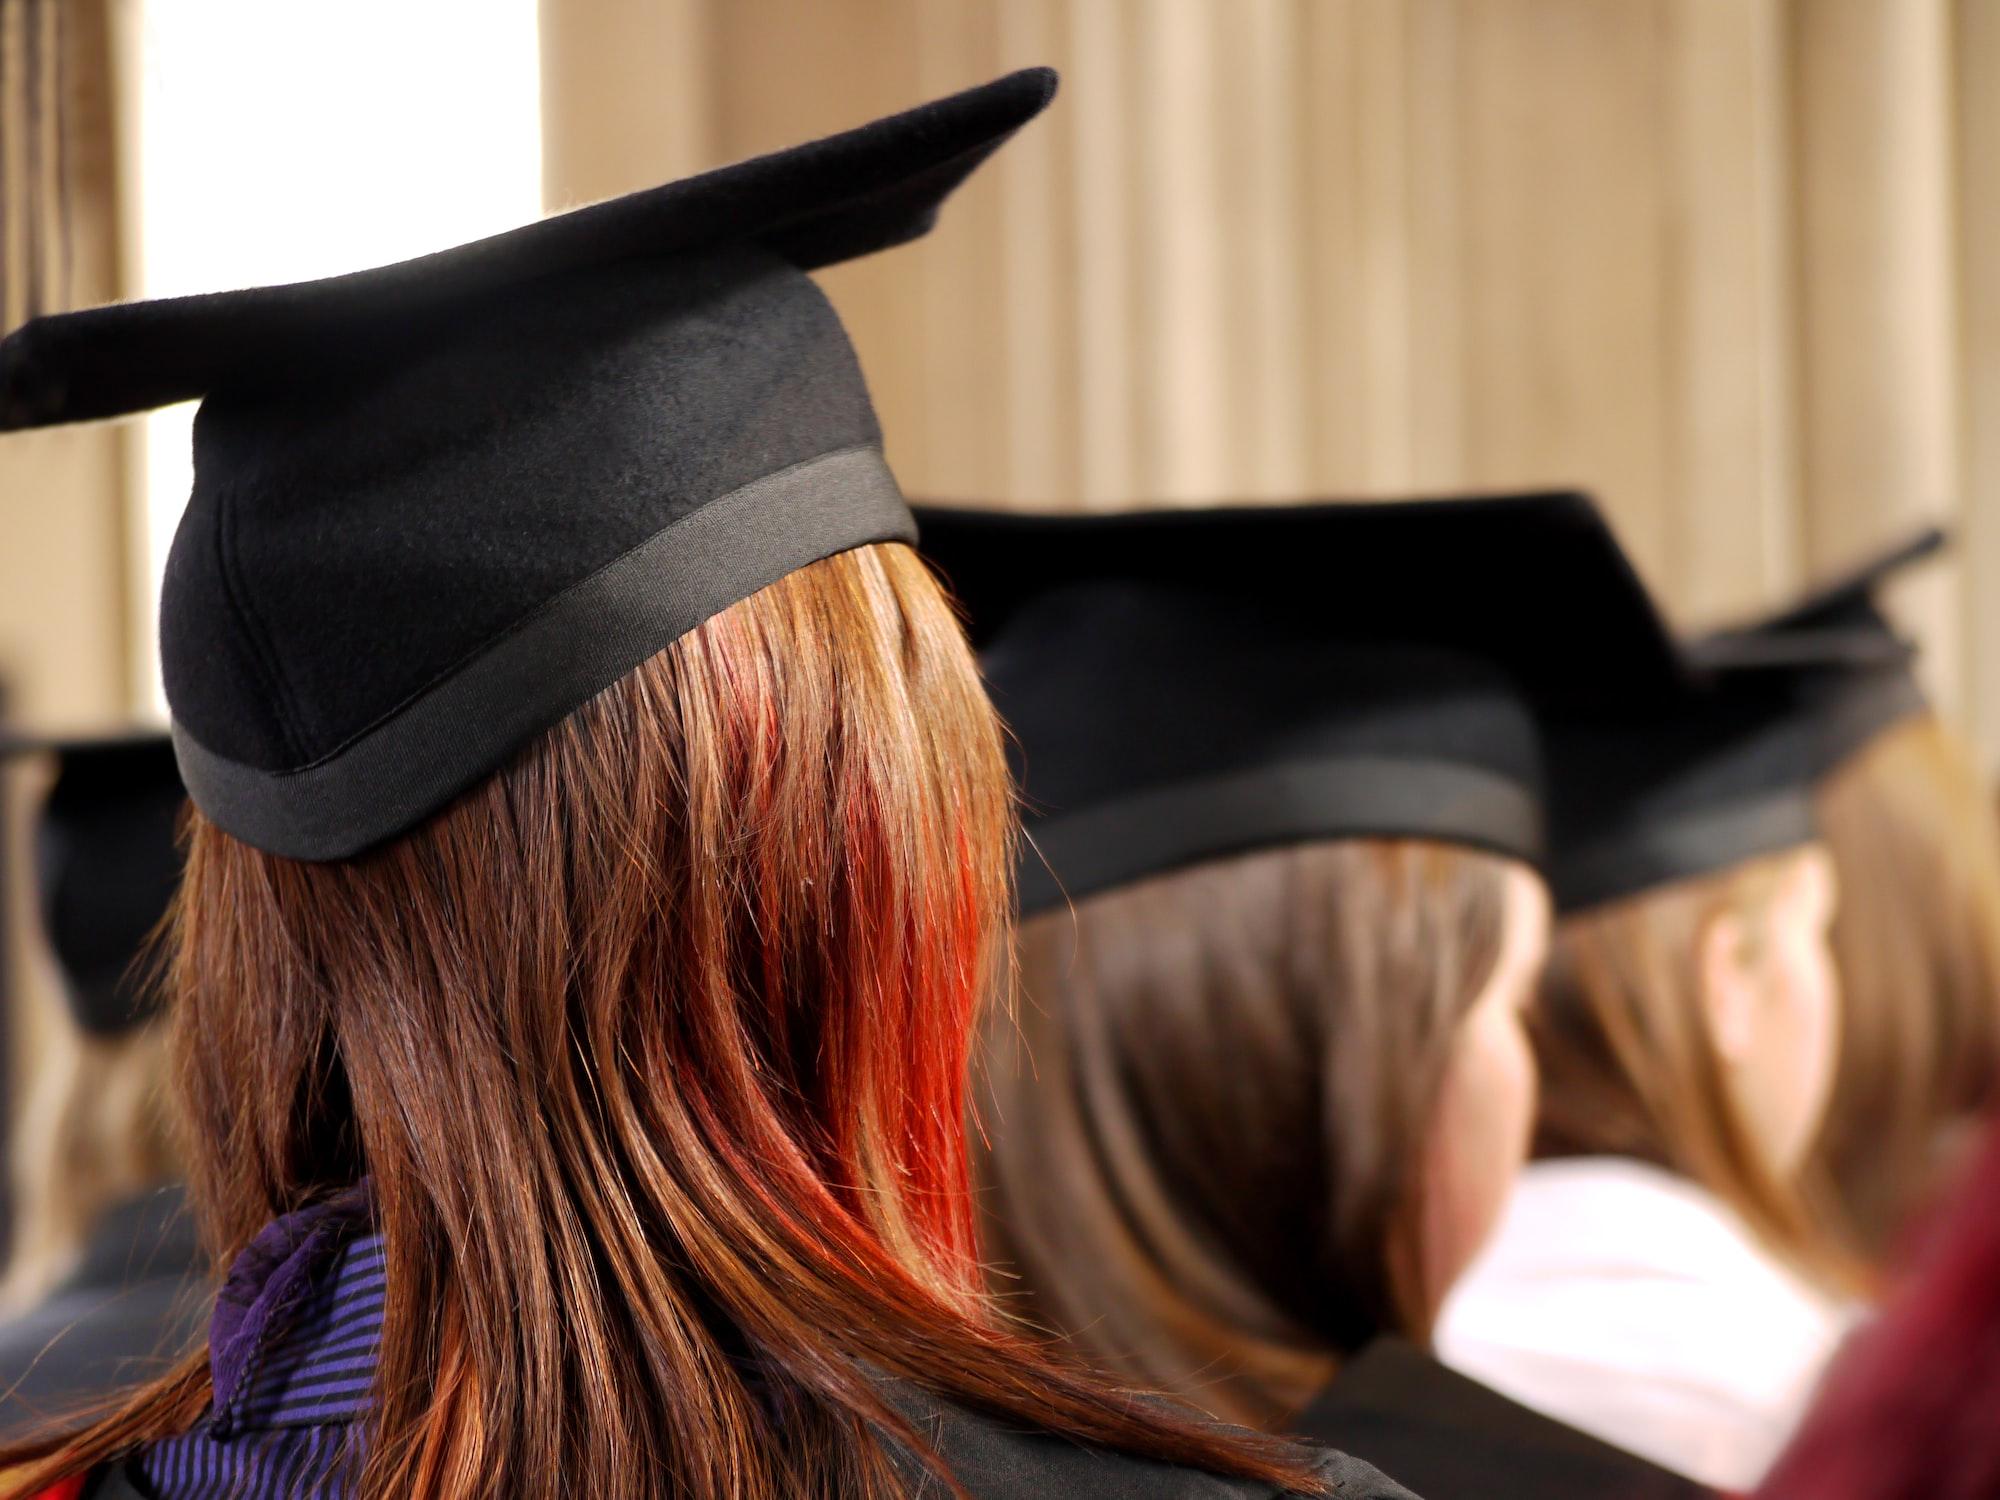 I'm still OK with charging graduates more